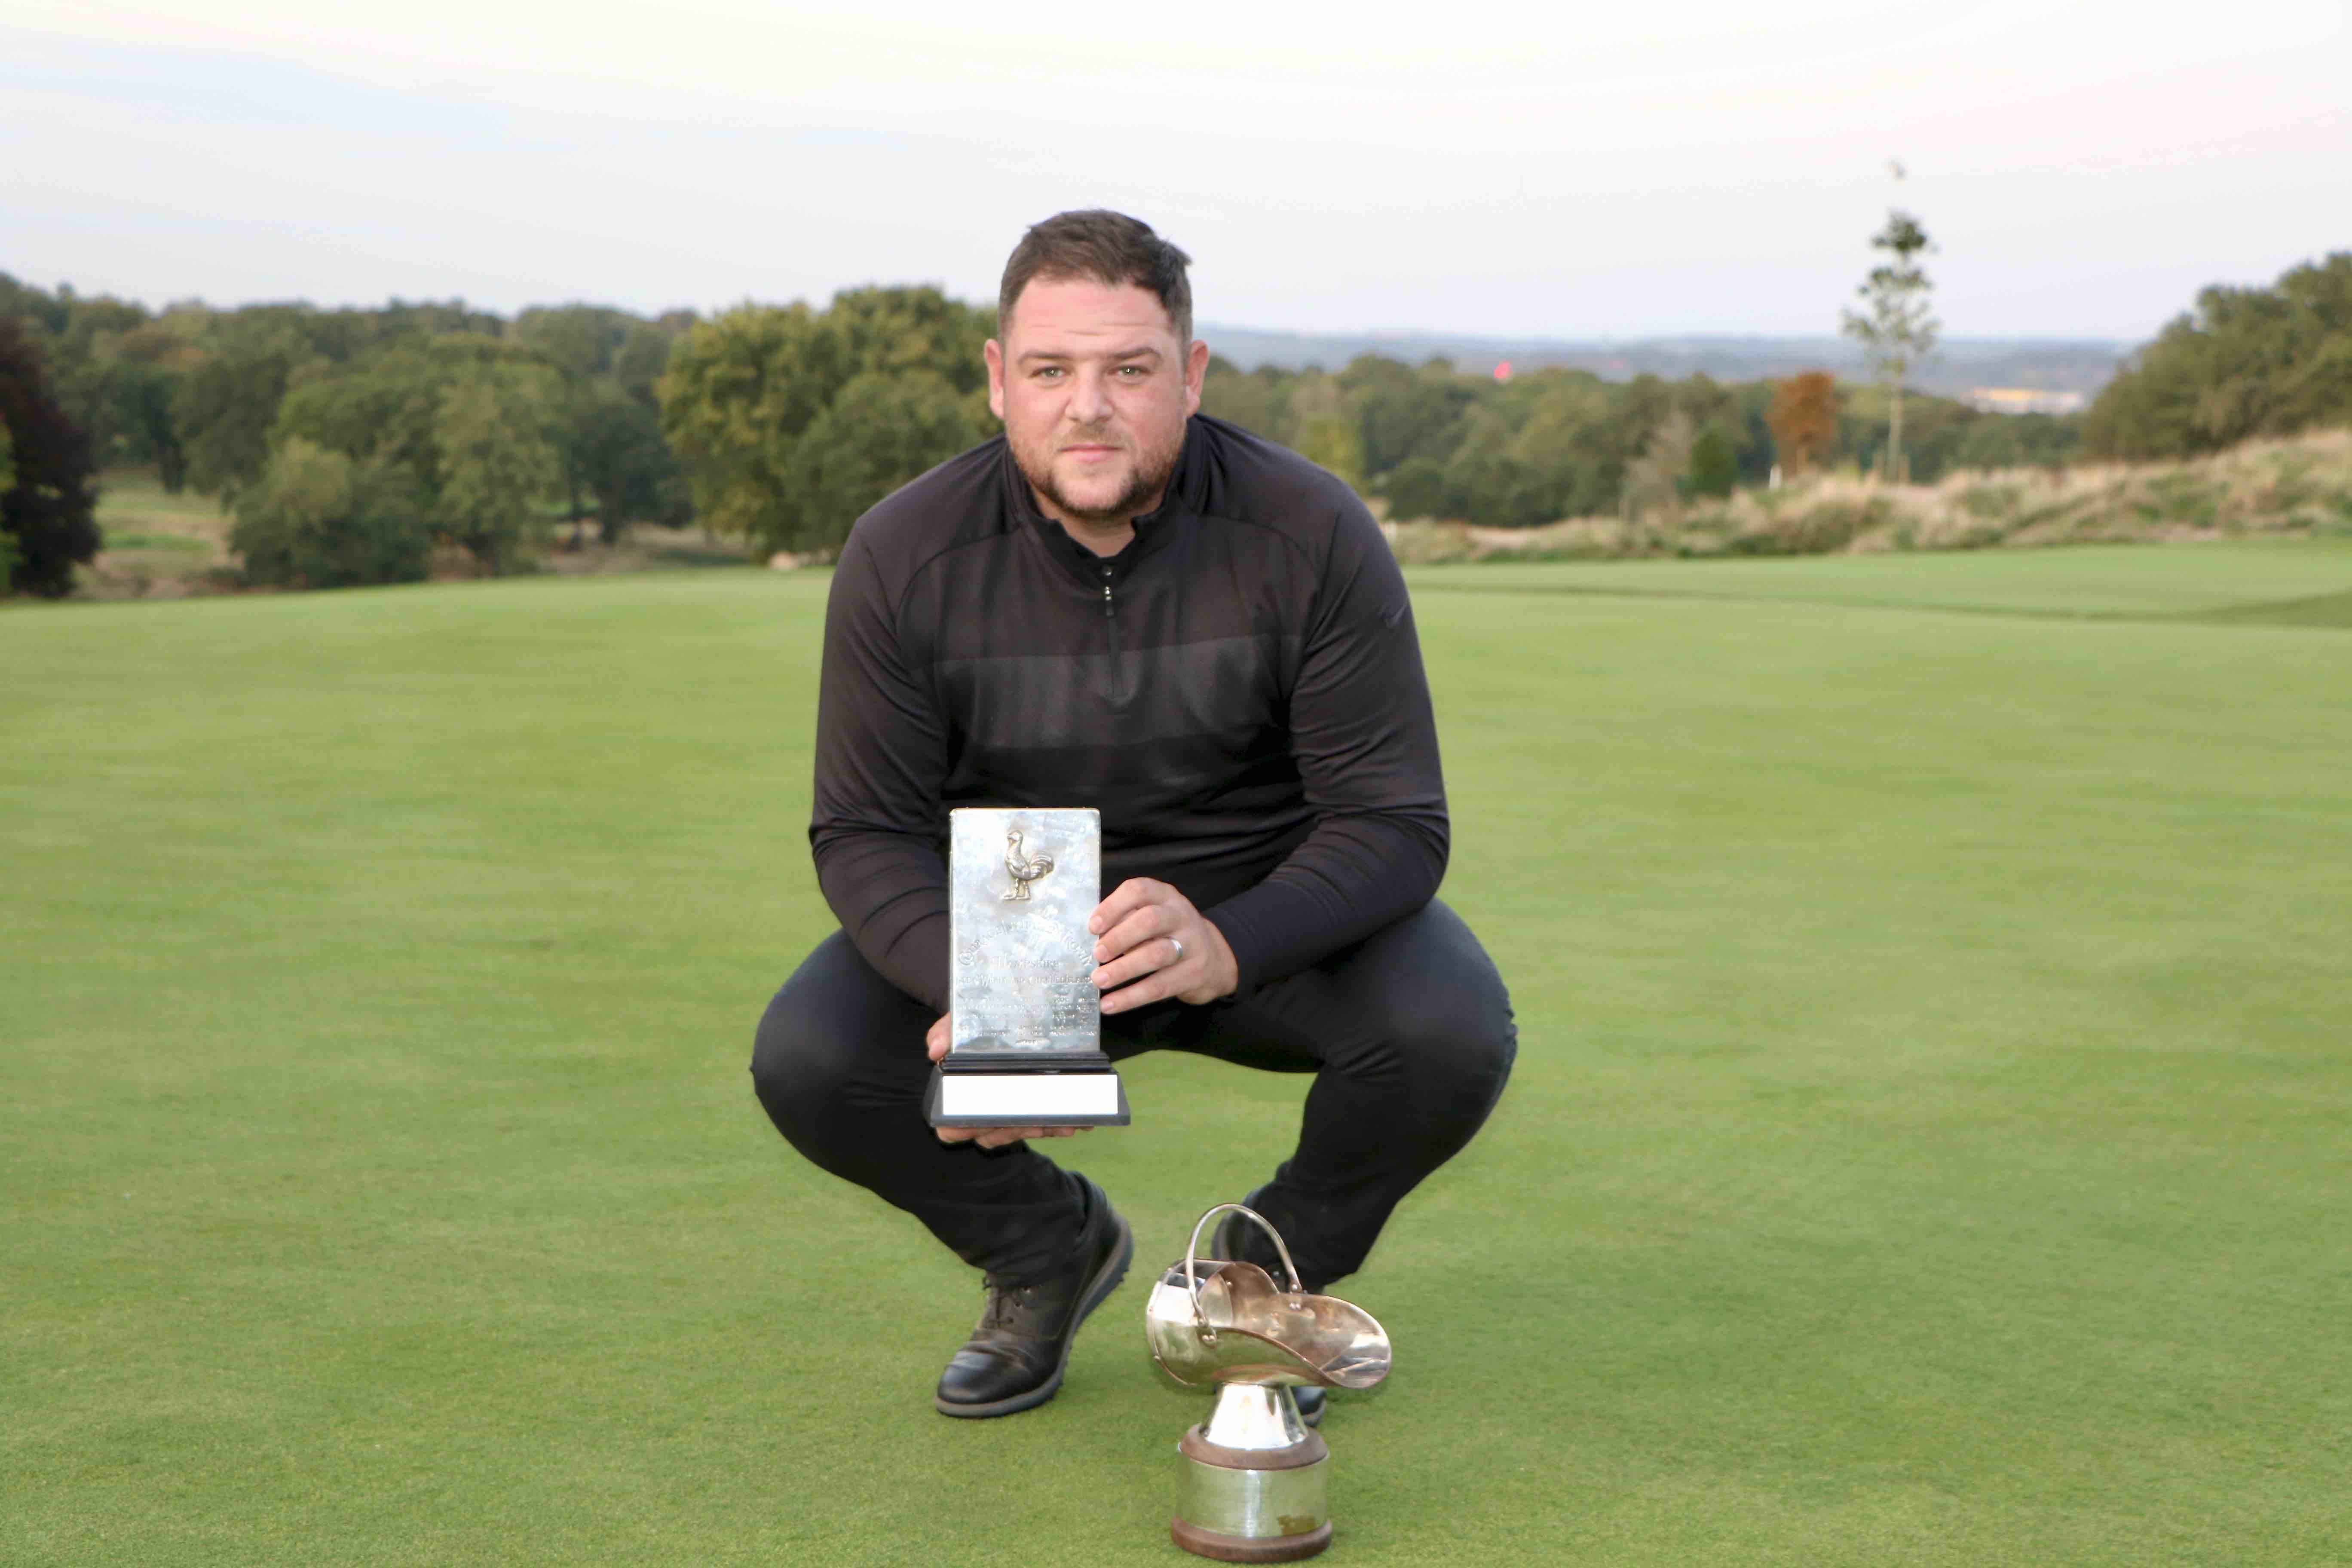 Ryan Moody Courage Trophy winner 2020